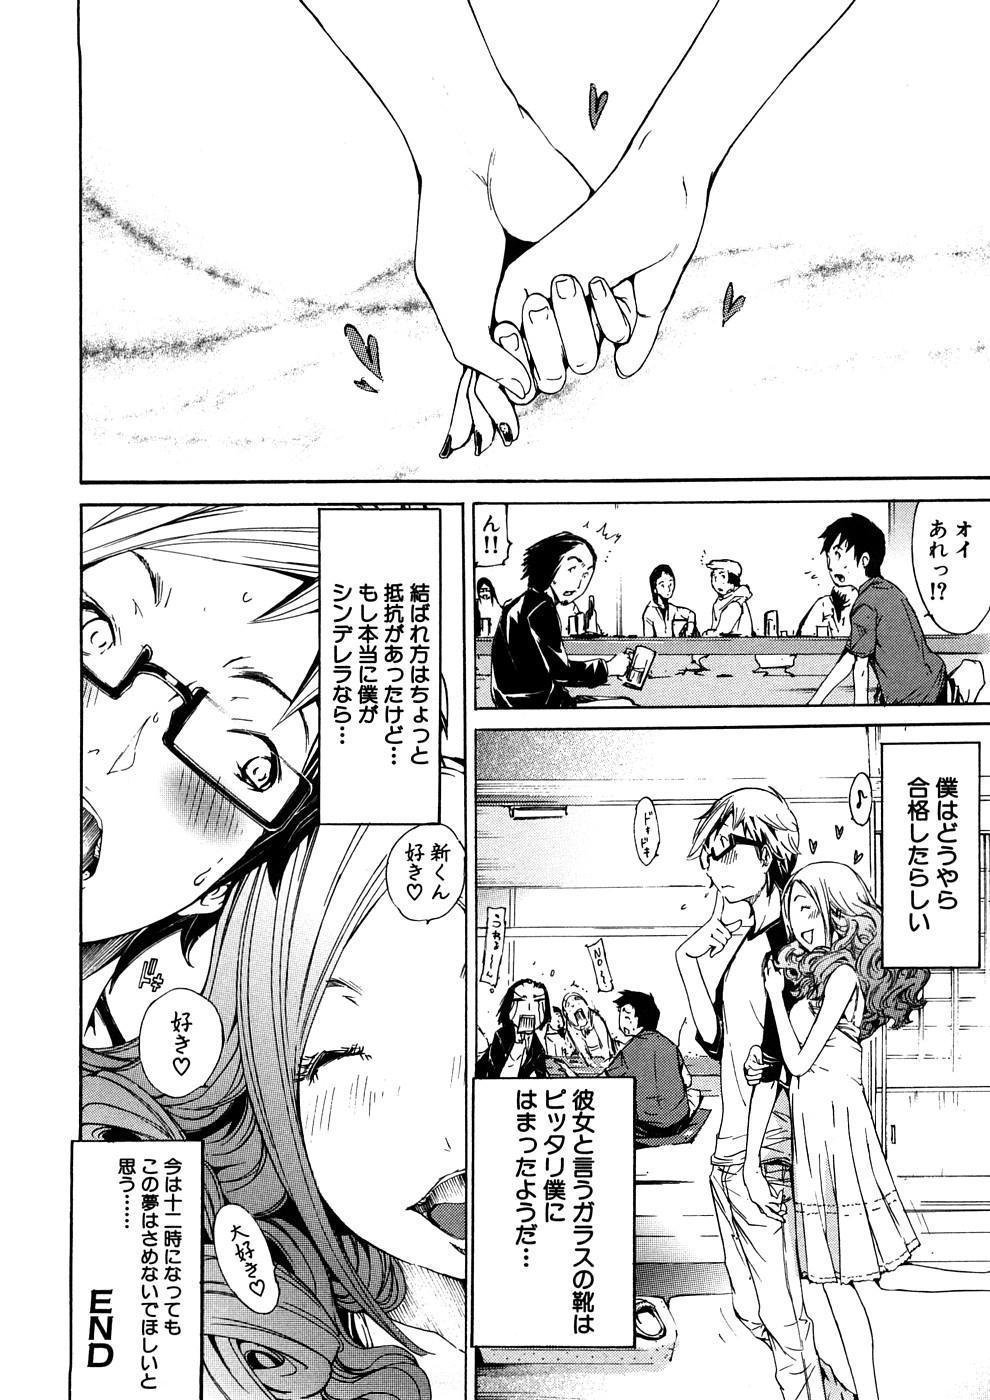 Geki Yaba Anthology Vol. 1 - Naka ni Dashite yo 46